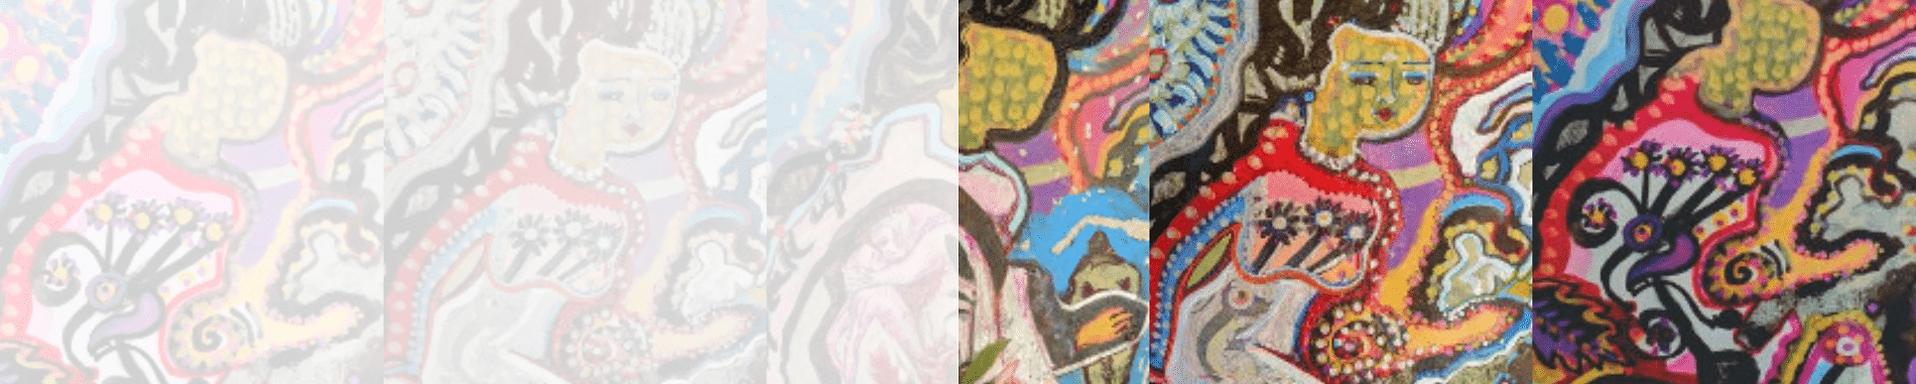 Canvas Revealx mix media reveal